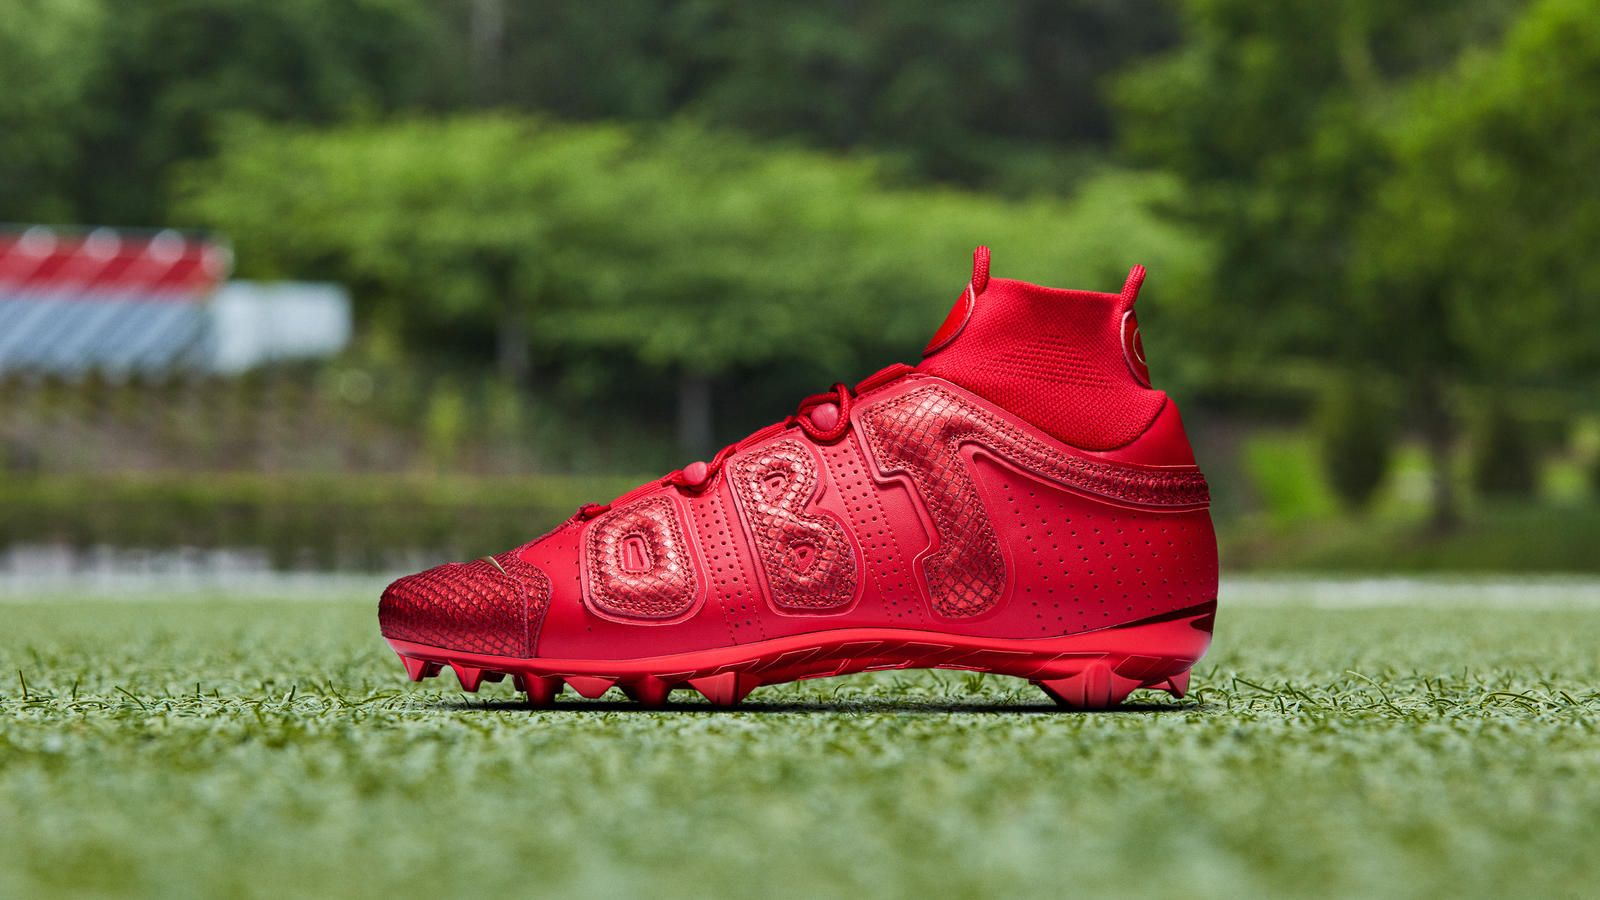 Nike Vapor Untouchable Pro 3 Obj Uptempo Cleat Nike Vapor Cleats Nike Football